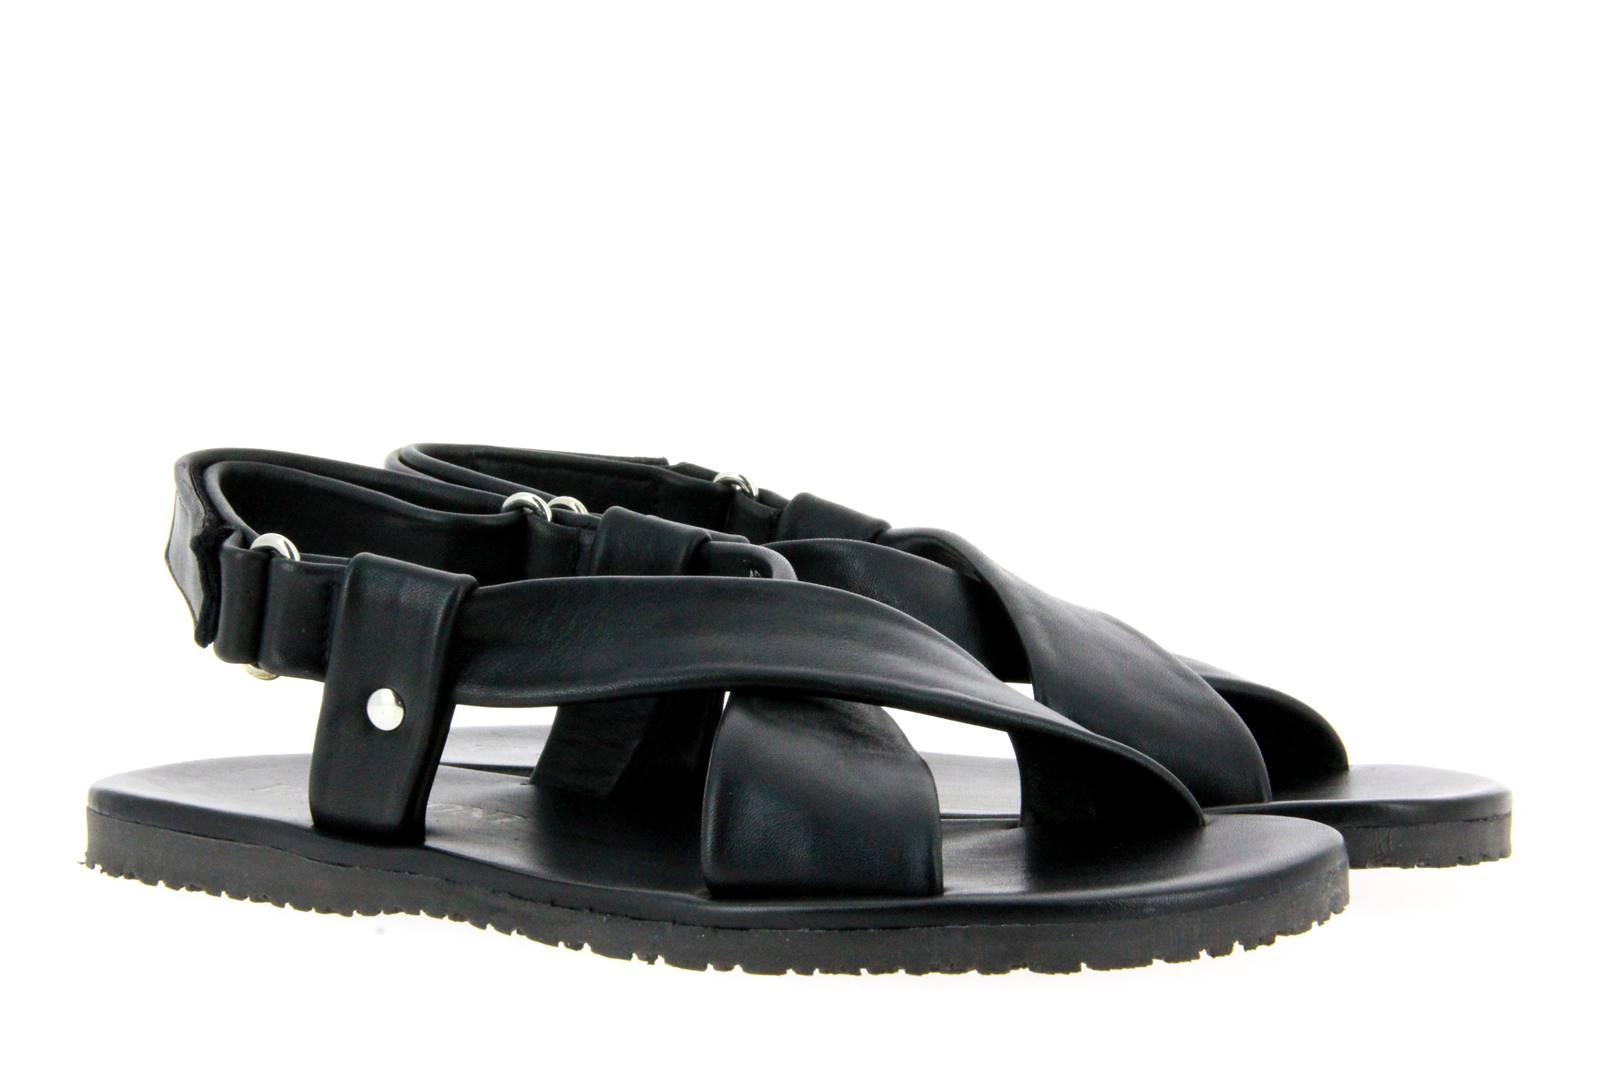 Emozioni Sandale LEAHTER BLACK M5478 (46)